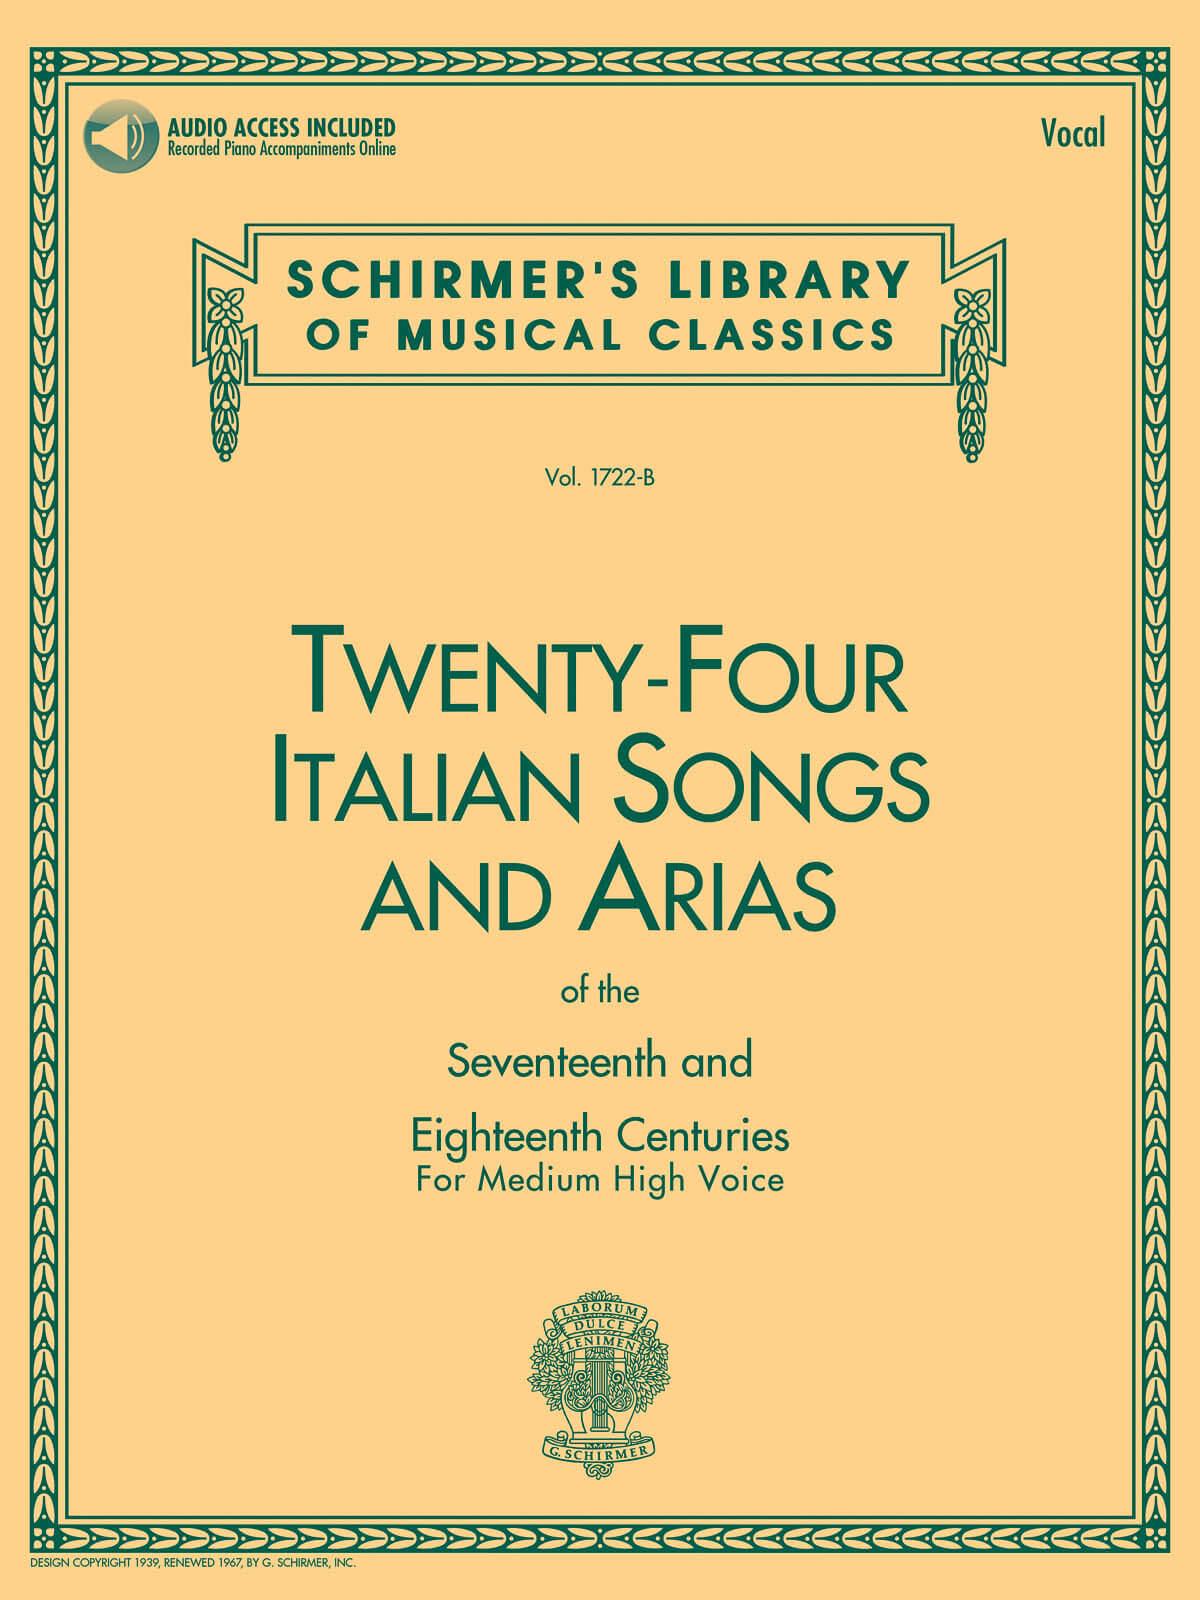 24 Italian Songs & Arias - Medium High Voice